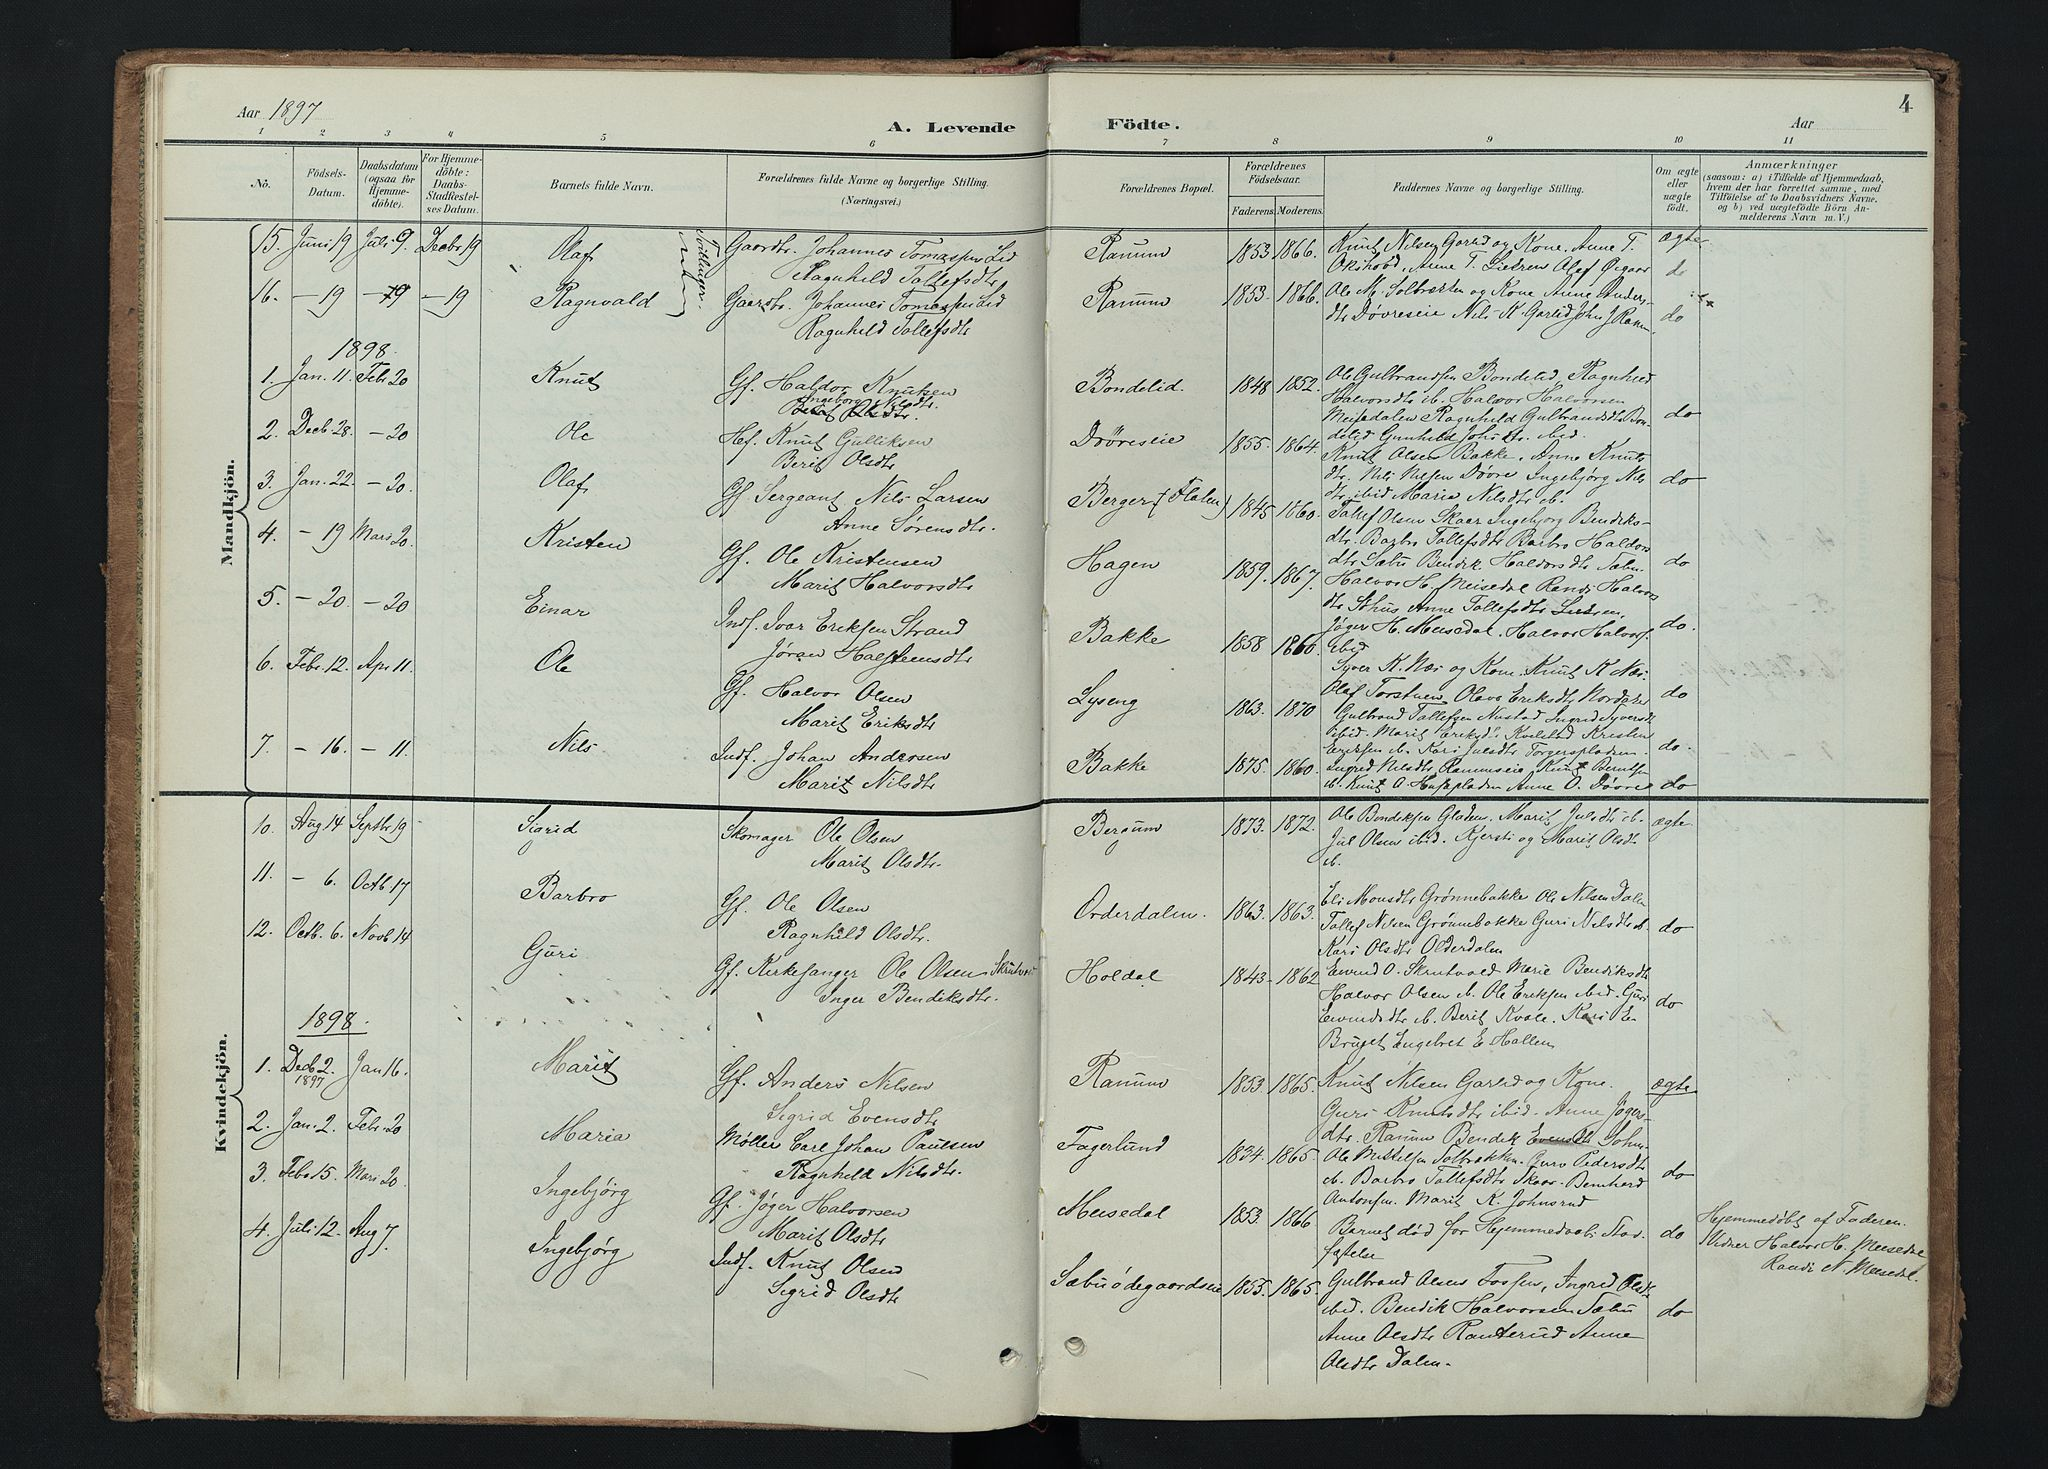 SAH, Nord-Aurdal prestekontor, Ministerialbok nr. 15, 1896-1914, s. 4